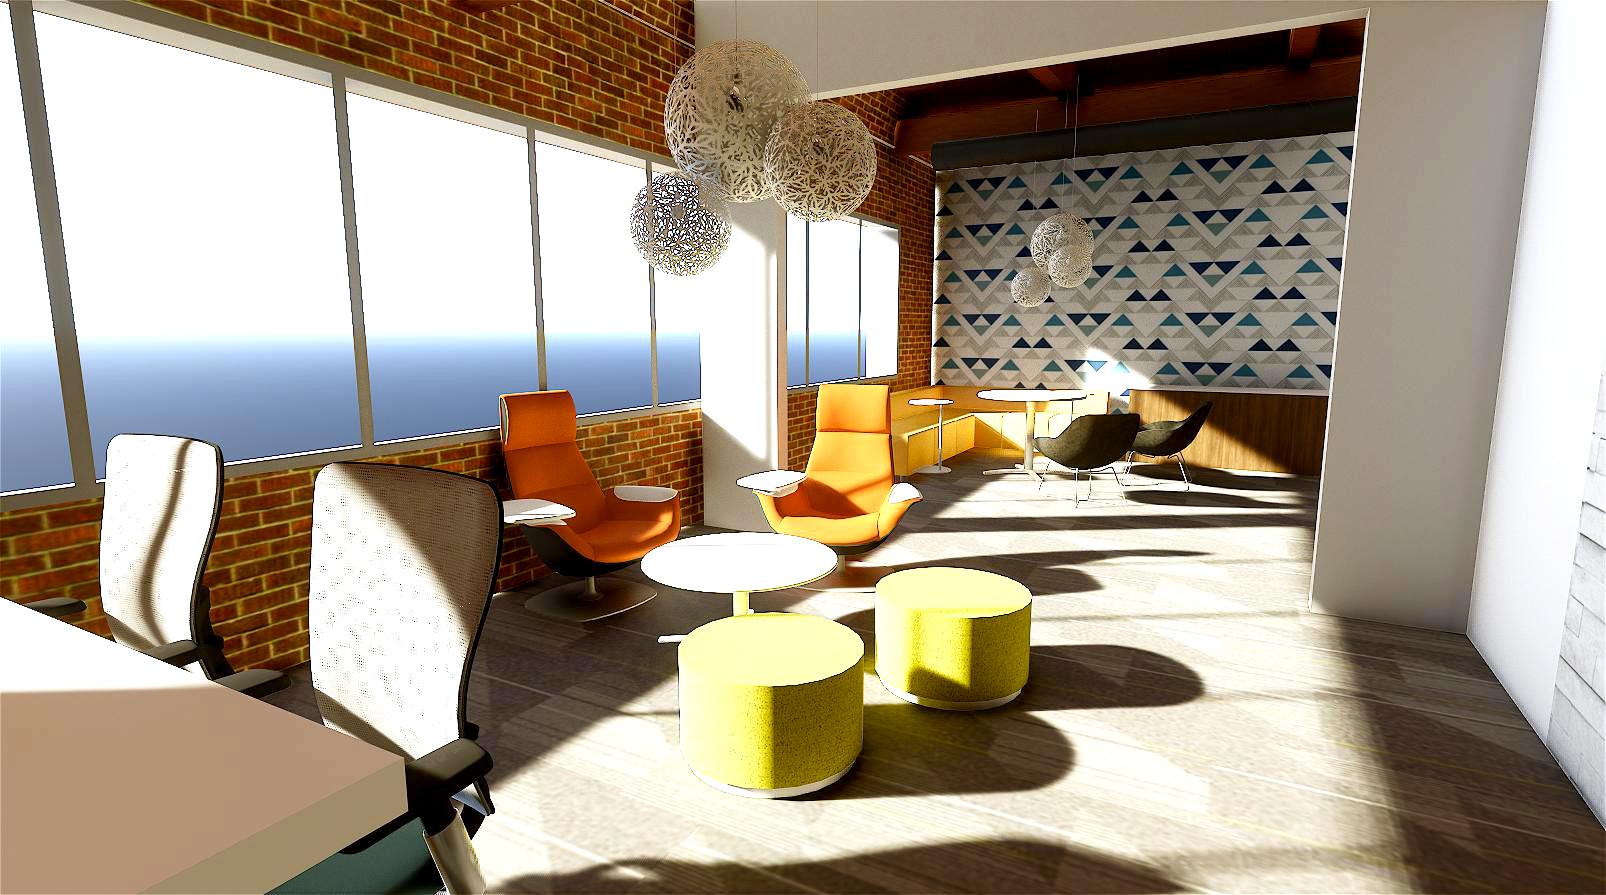 Wightman Kalamazoo medium conference room rendering